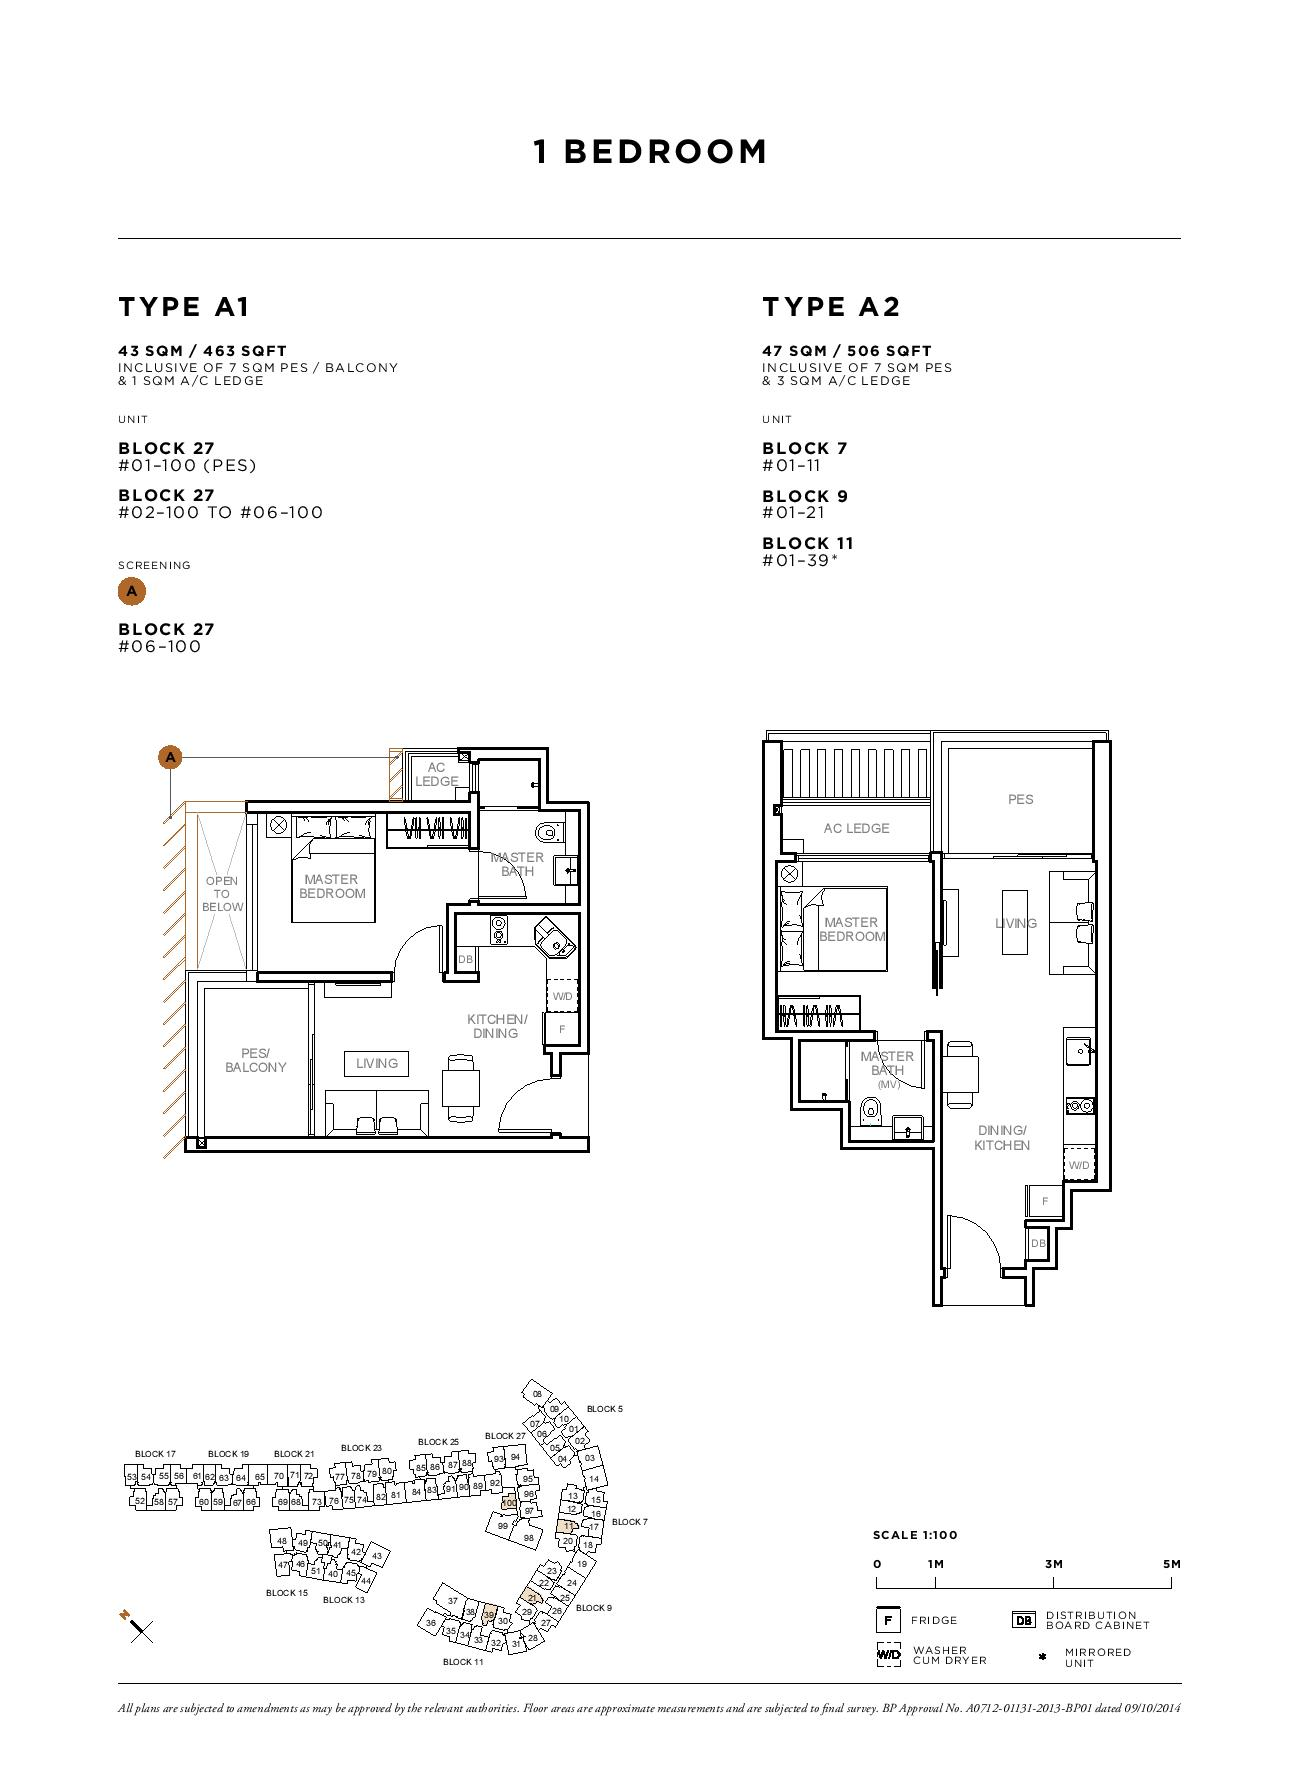 Sophia Hills 1 Bedroom Type A1, A2 Floor Plans